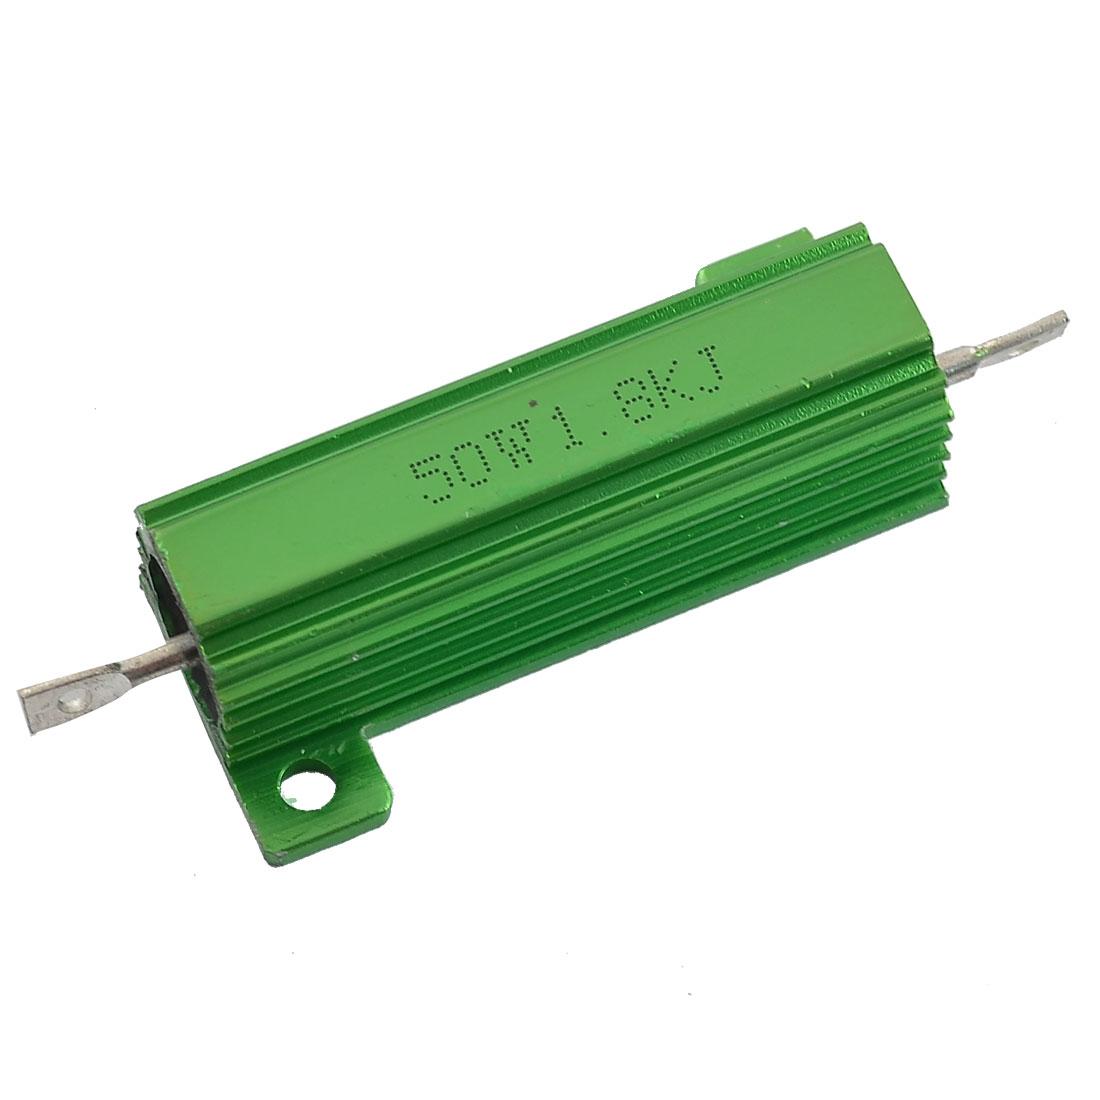 50W Watt 1.8K Ohm 5% Aluminum Casing Wirewound Resistor